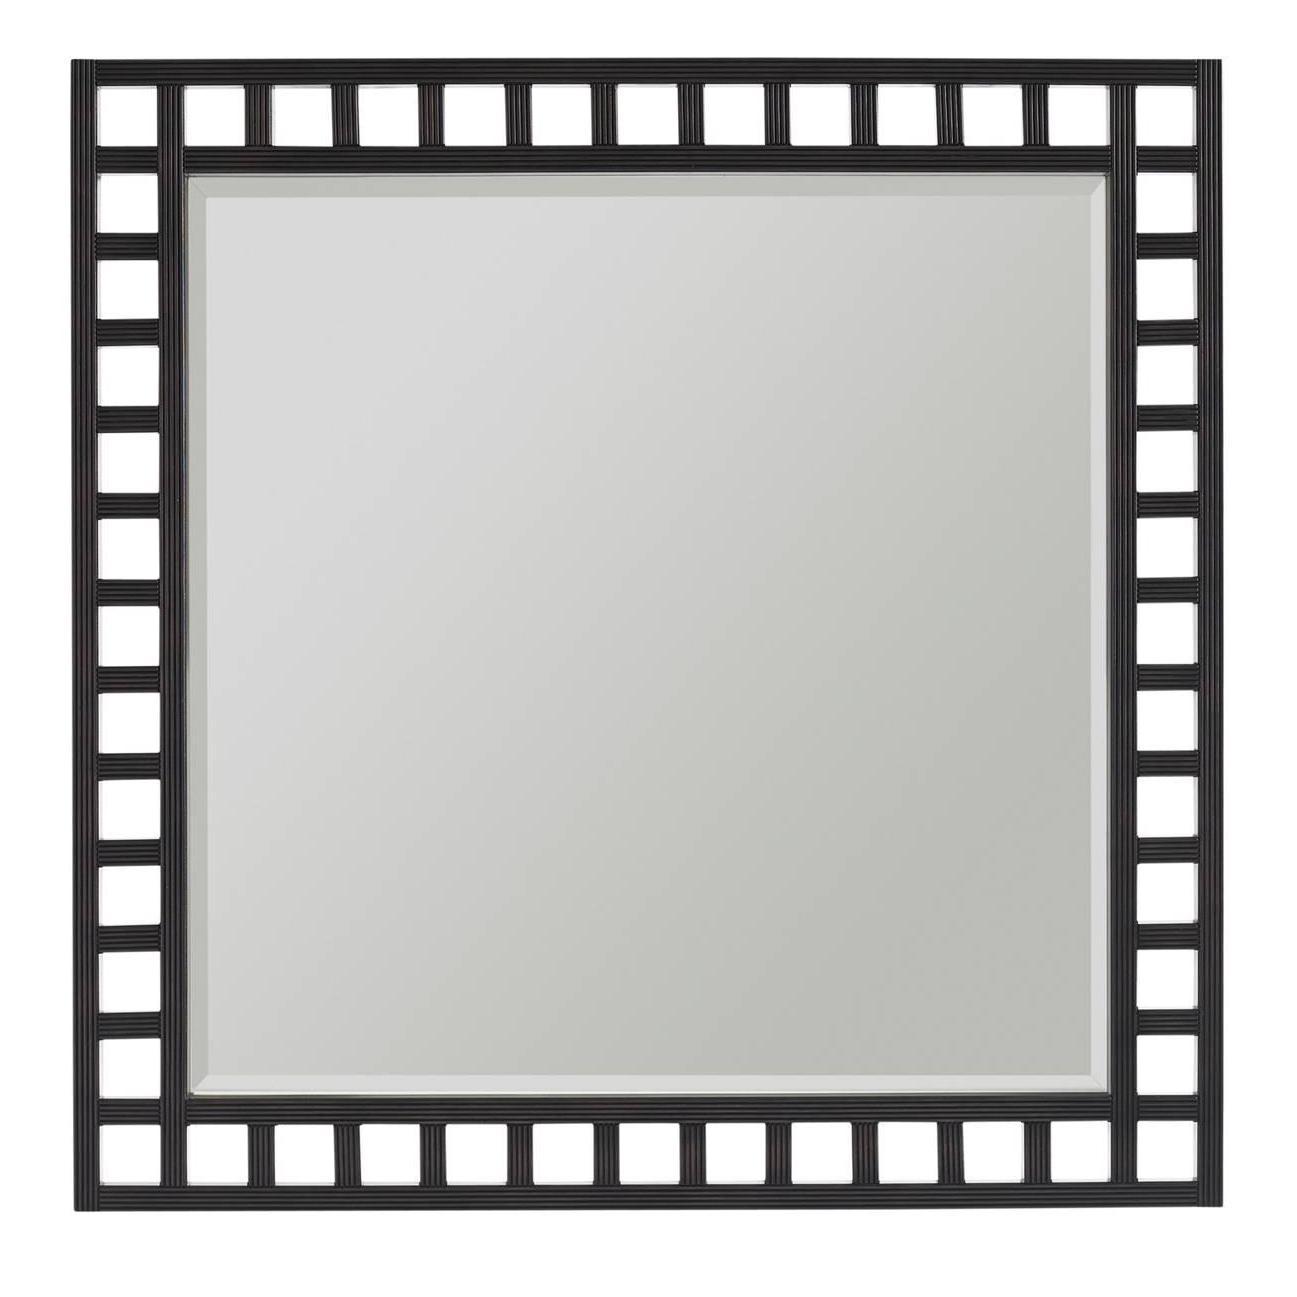 Stanley Furniture Wicker Park  Mirror - Item Number: 409-13-30